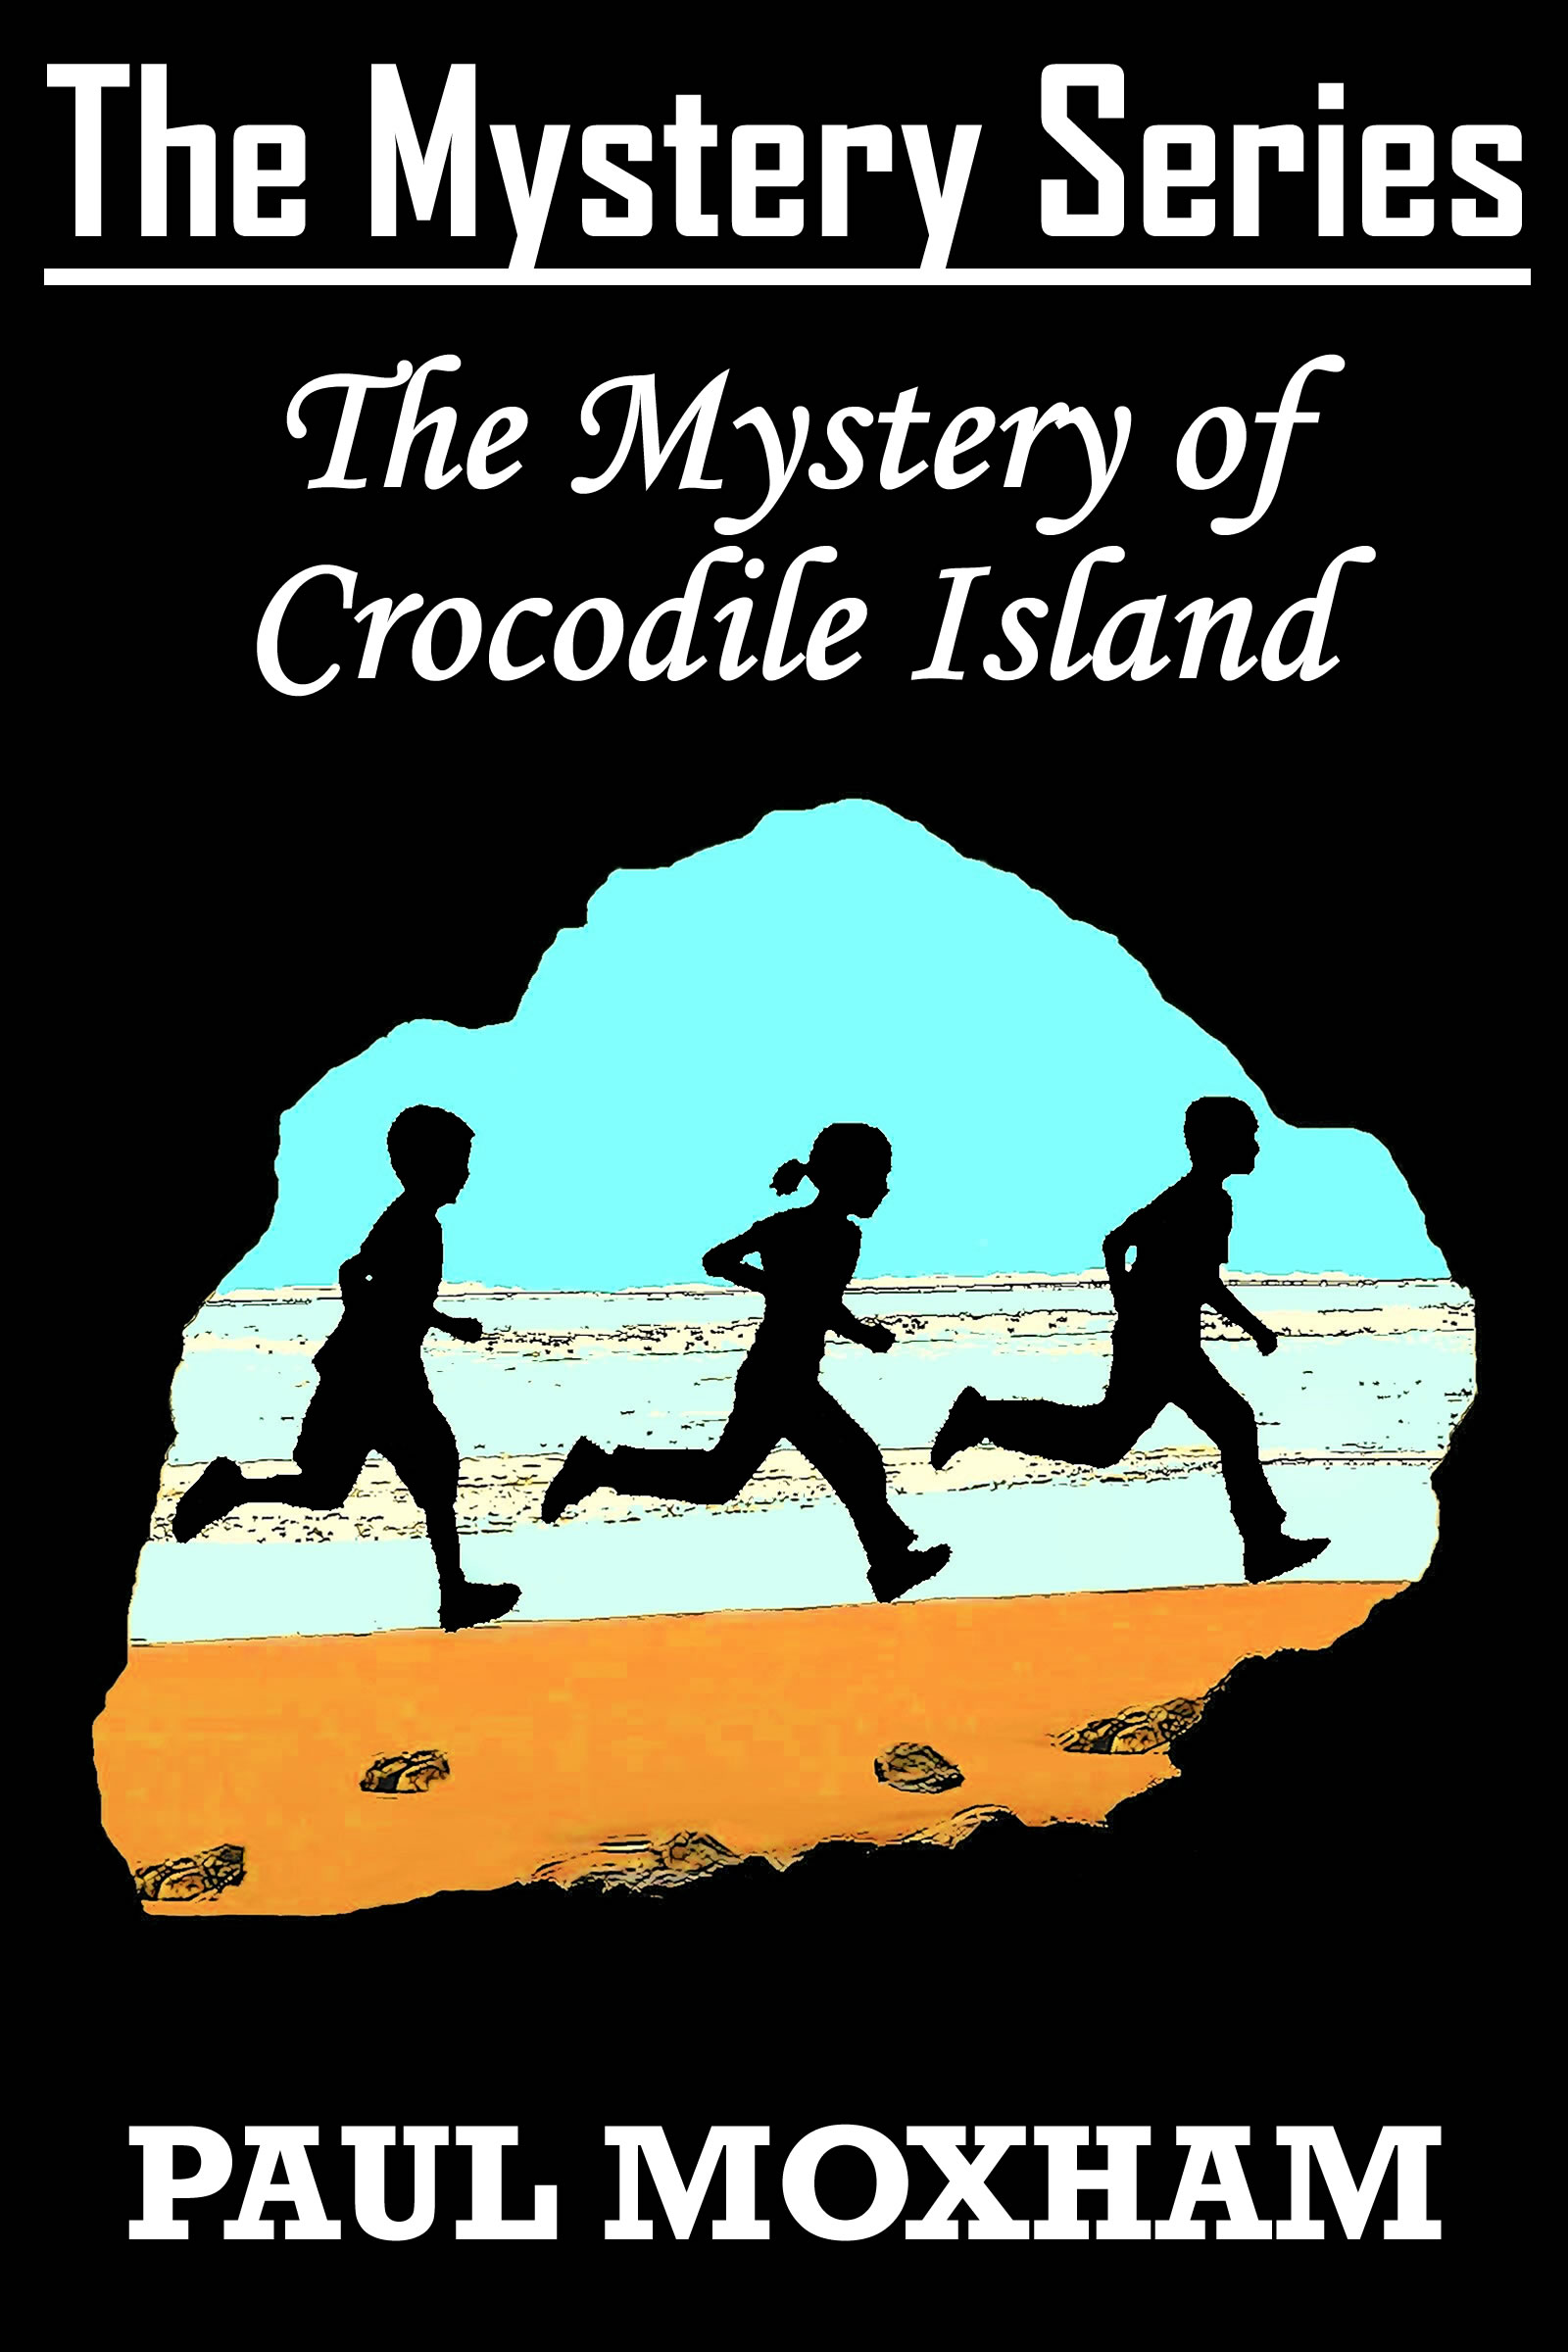 The Mystery of Crocodile Island